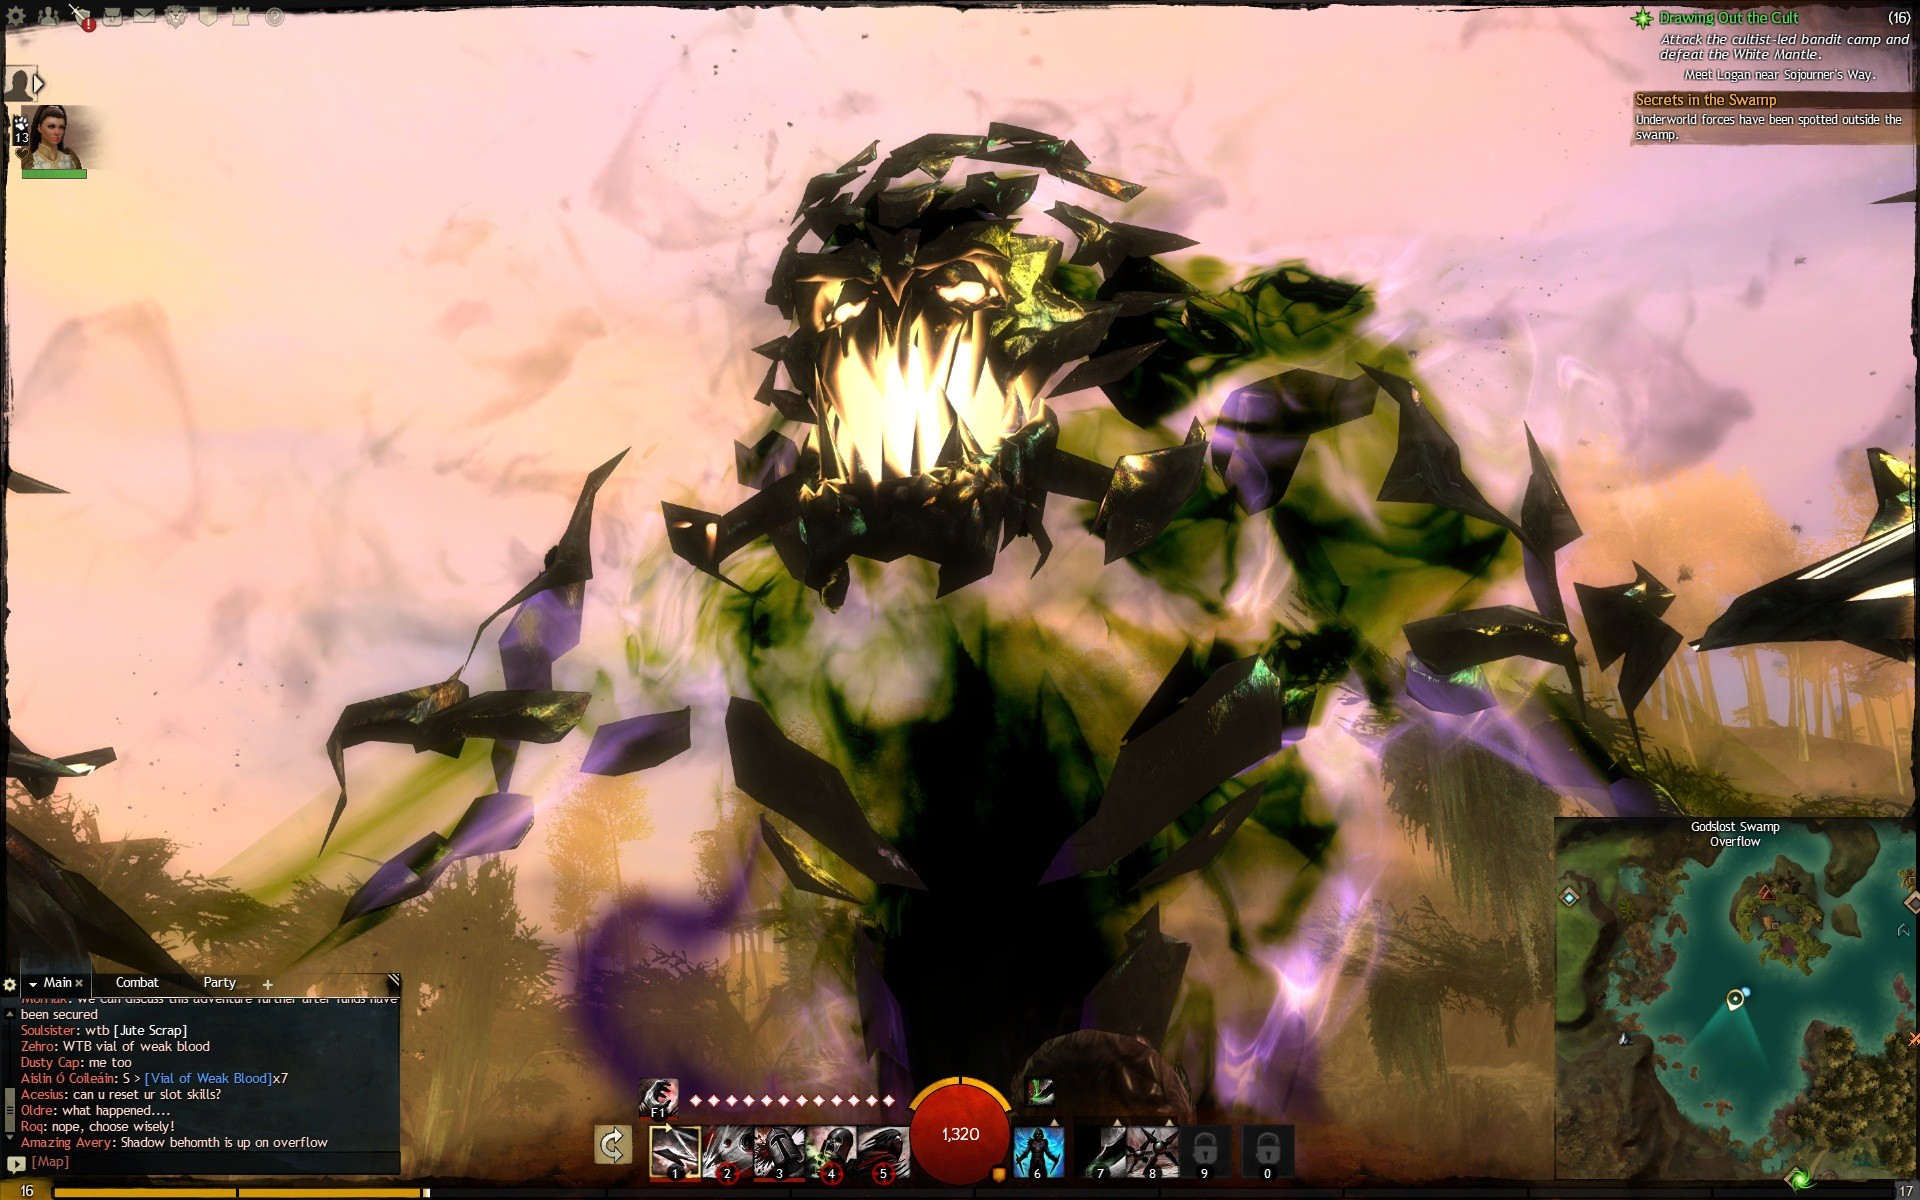 Shadow Behemoth Lvl 15 Boss Guild Wars 2 Galleries